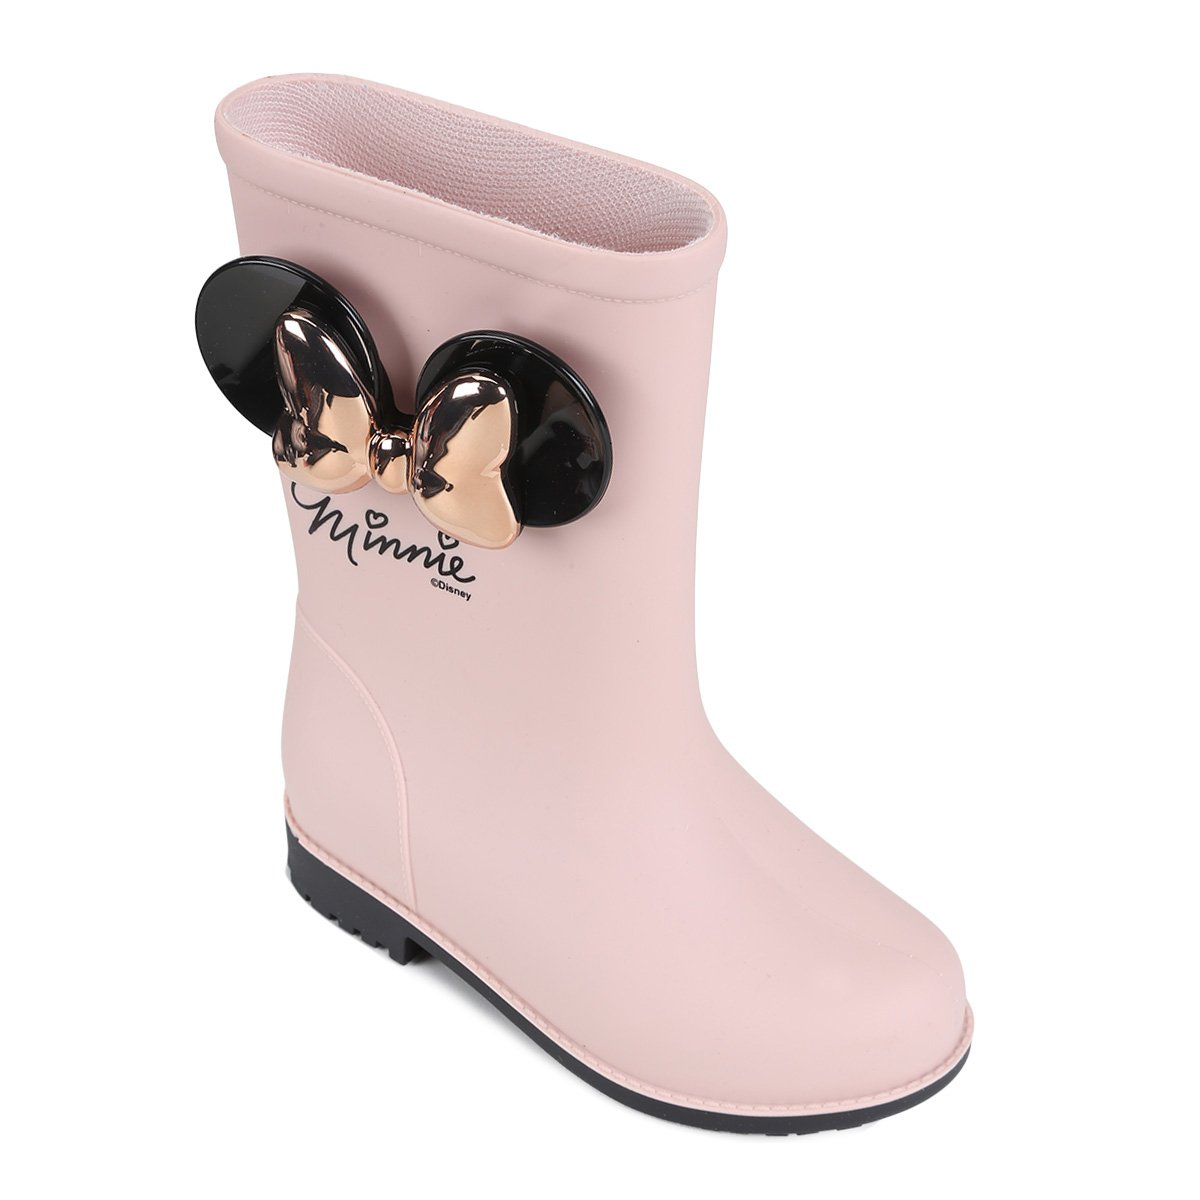 386d568efd3 Bota Infantil Galocha Grendene Disney Fashion Feminina - Rosa e Preto -  Compre Agora